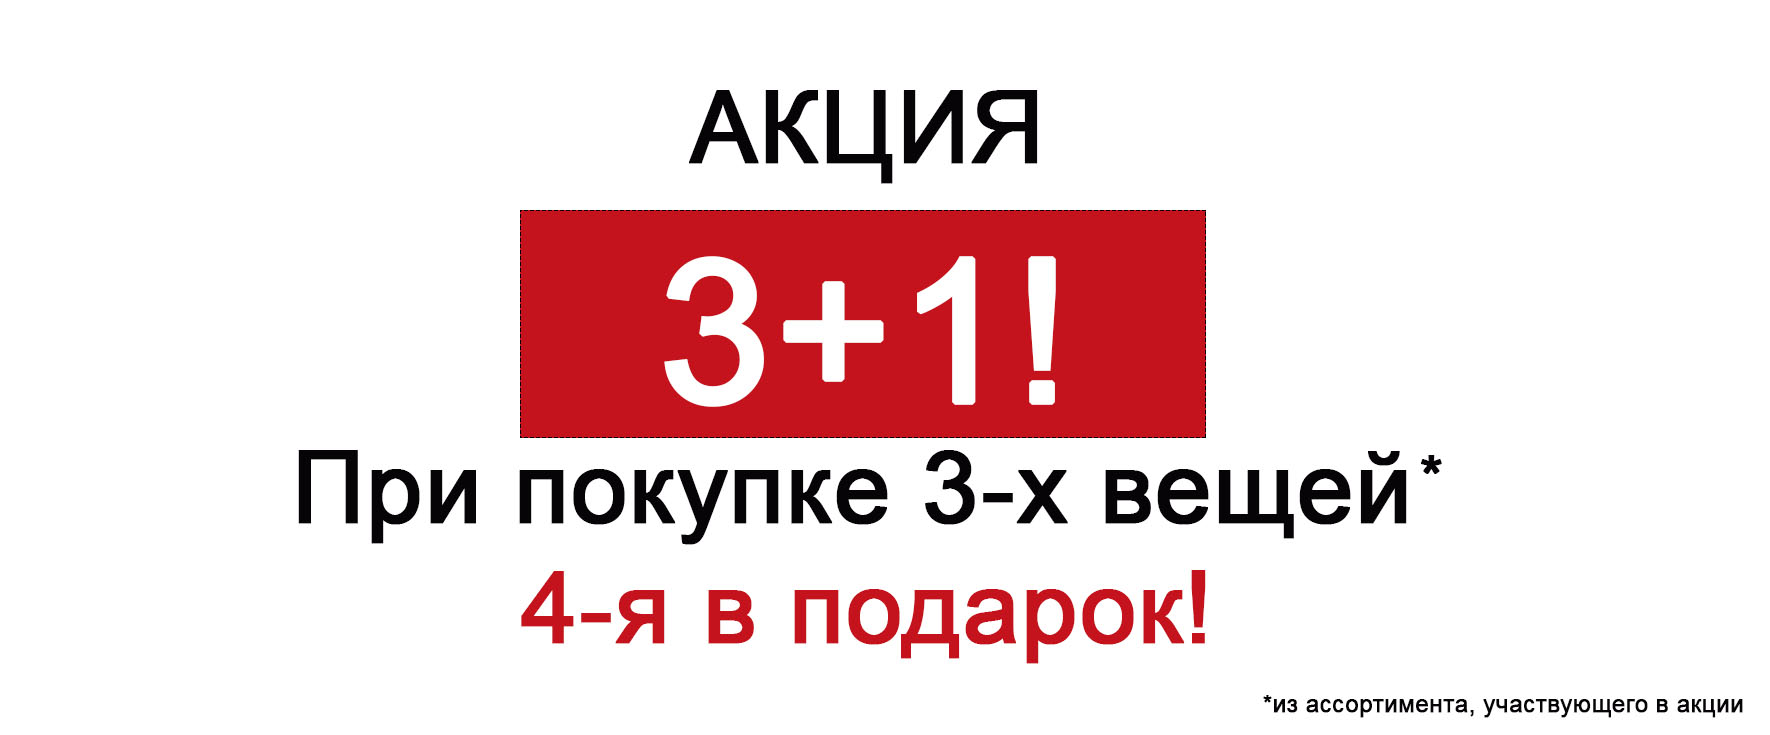 Акция 3+1 (1)